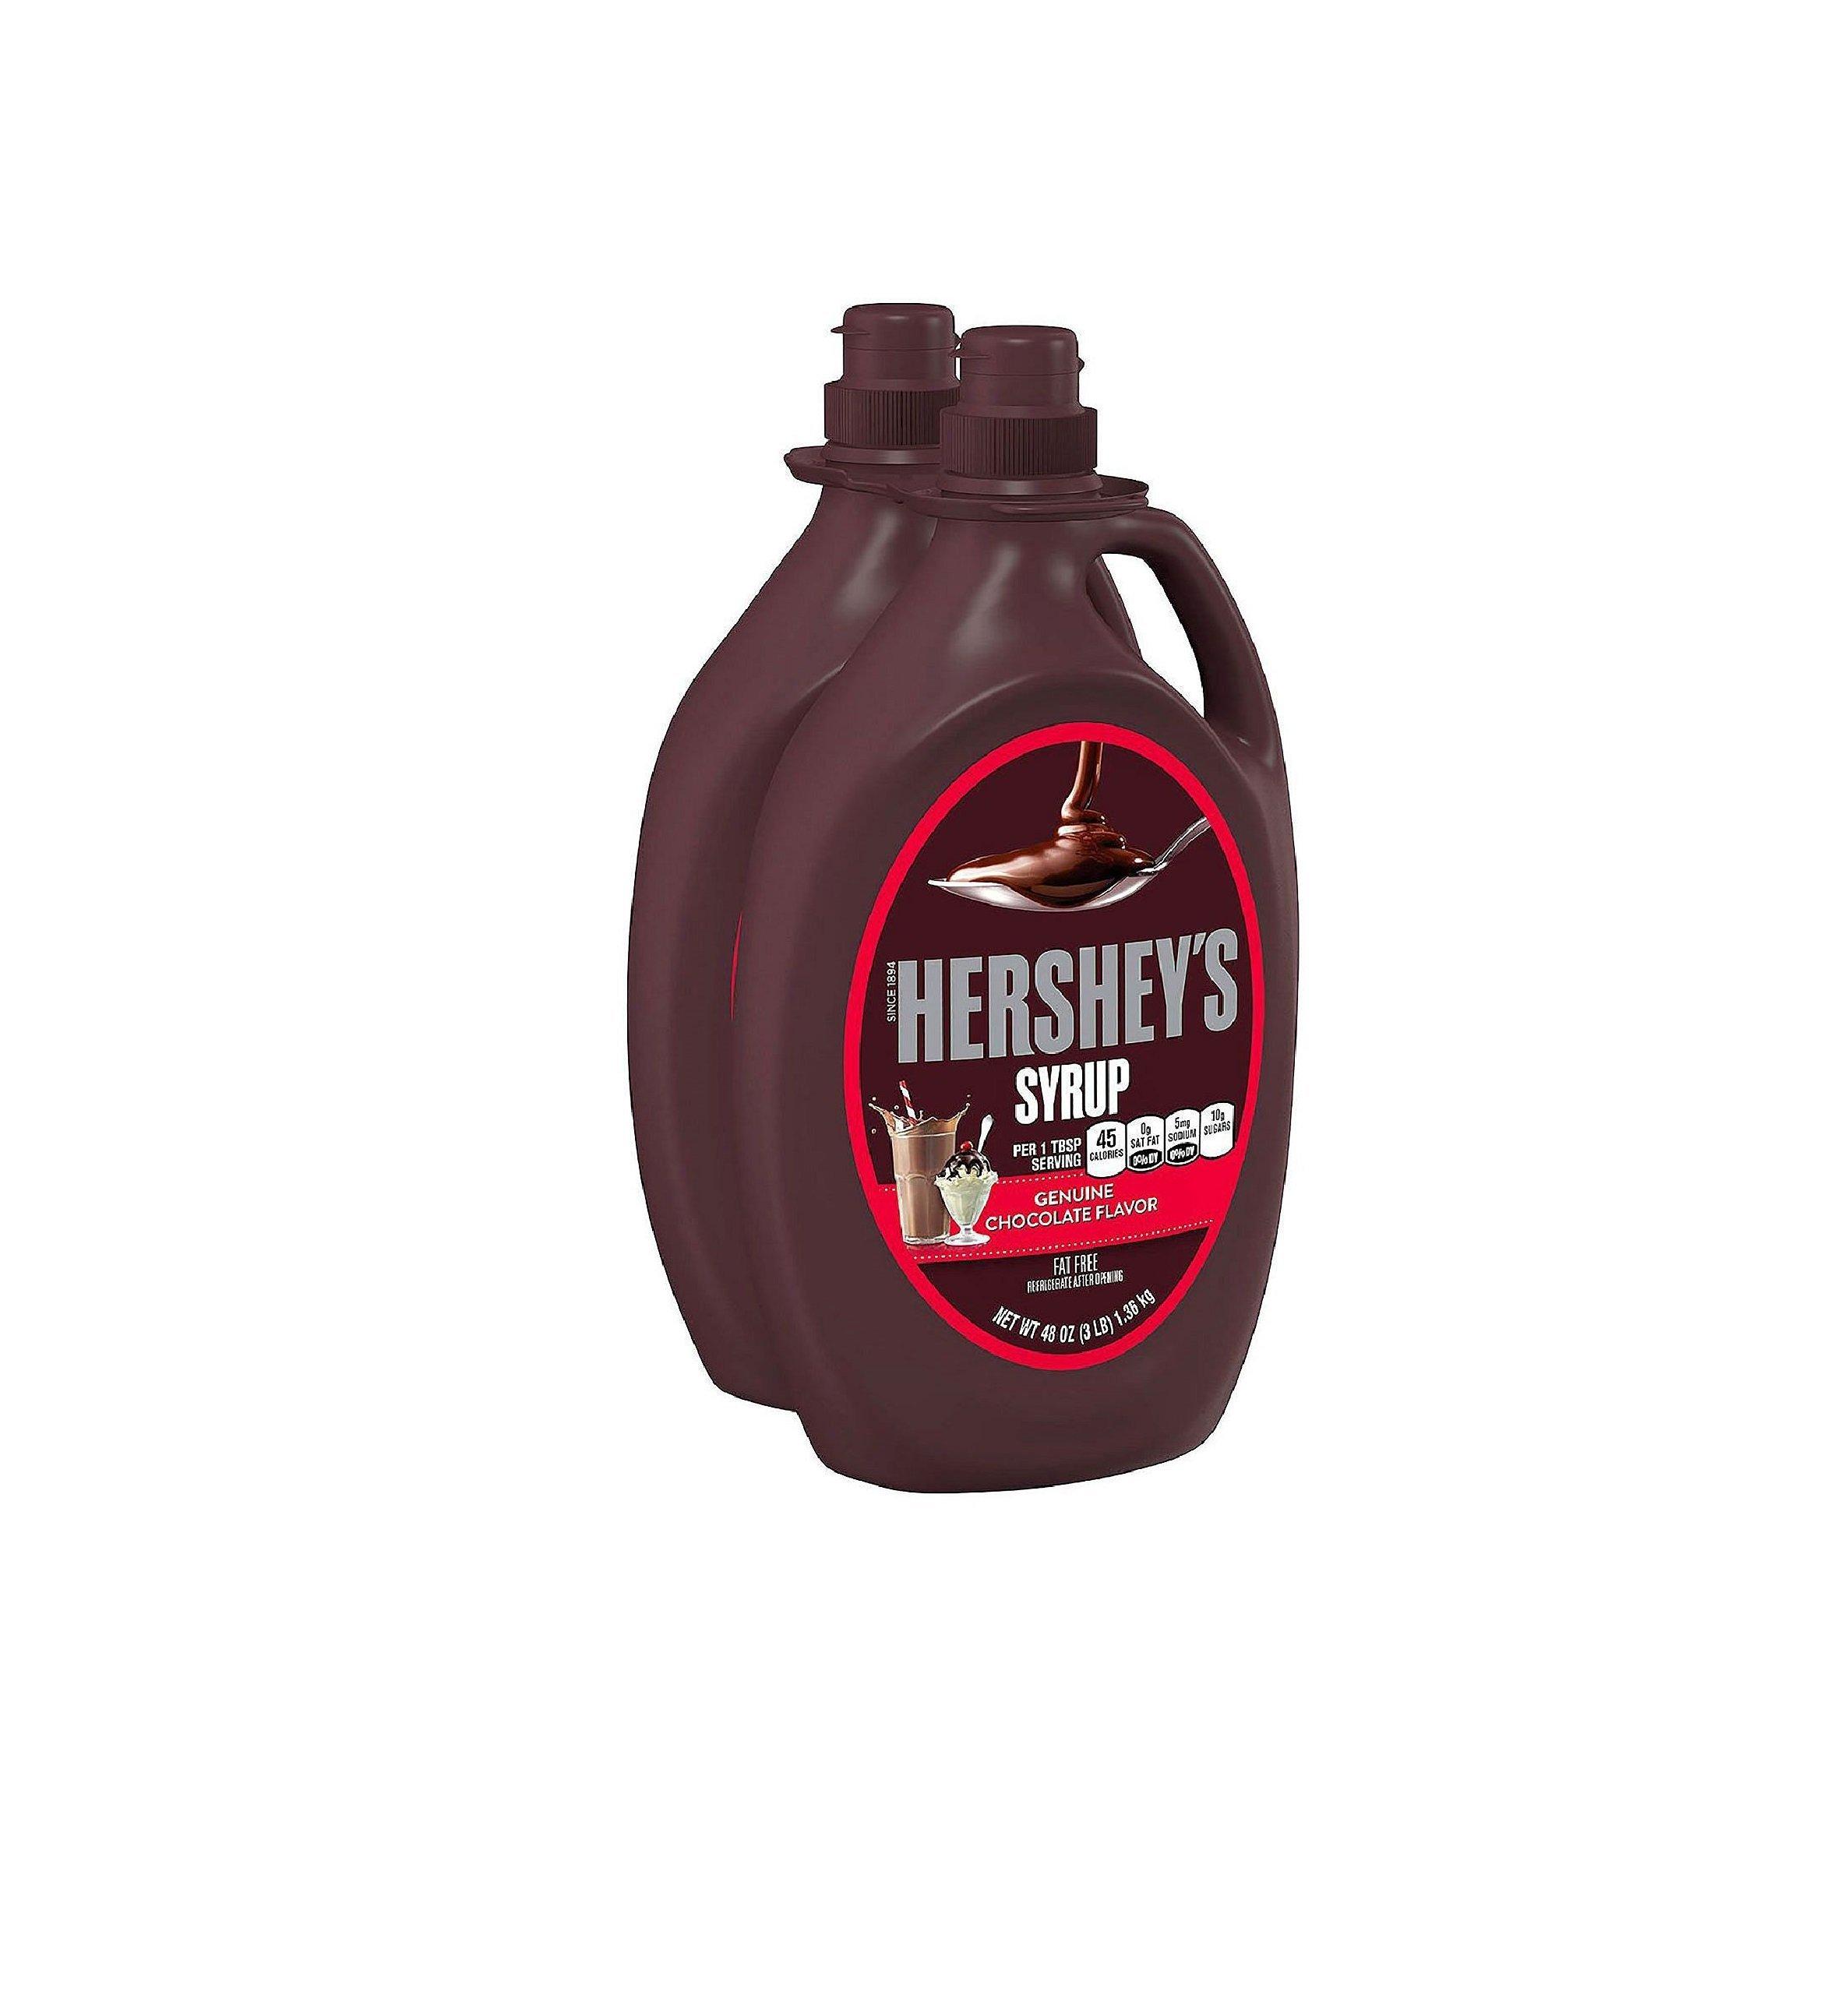 Hershey's Syrup, Chocolate (48 oz. bottle, 2 ct.)